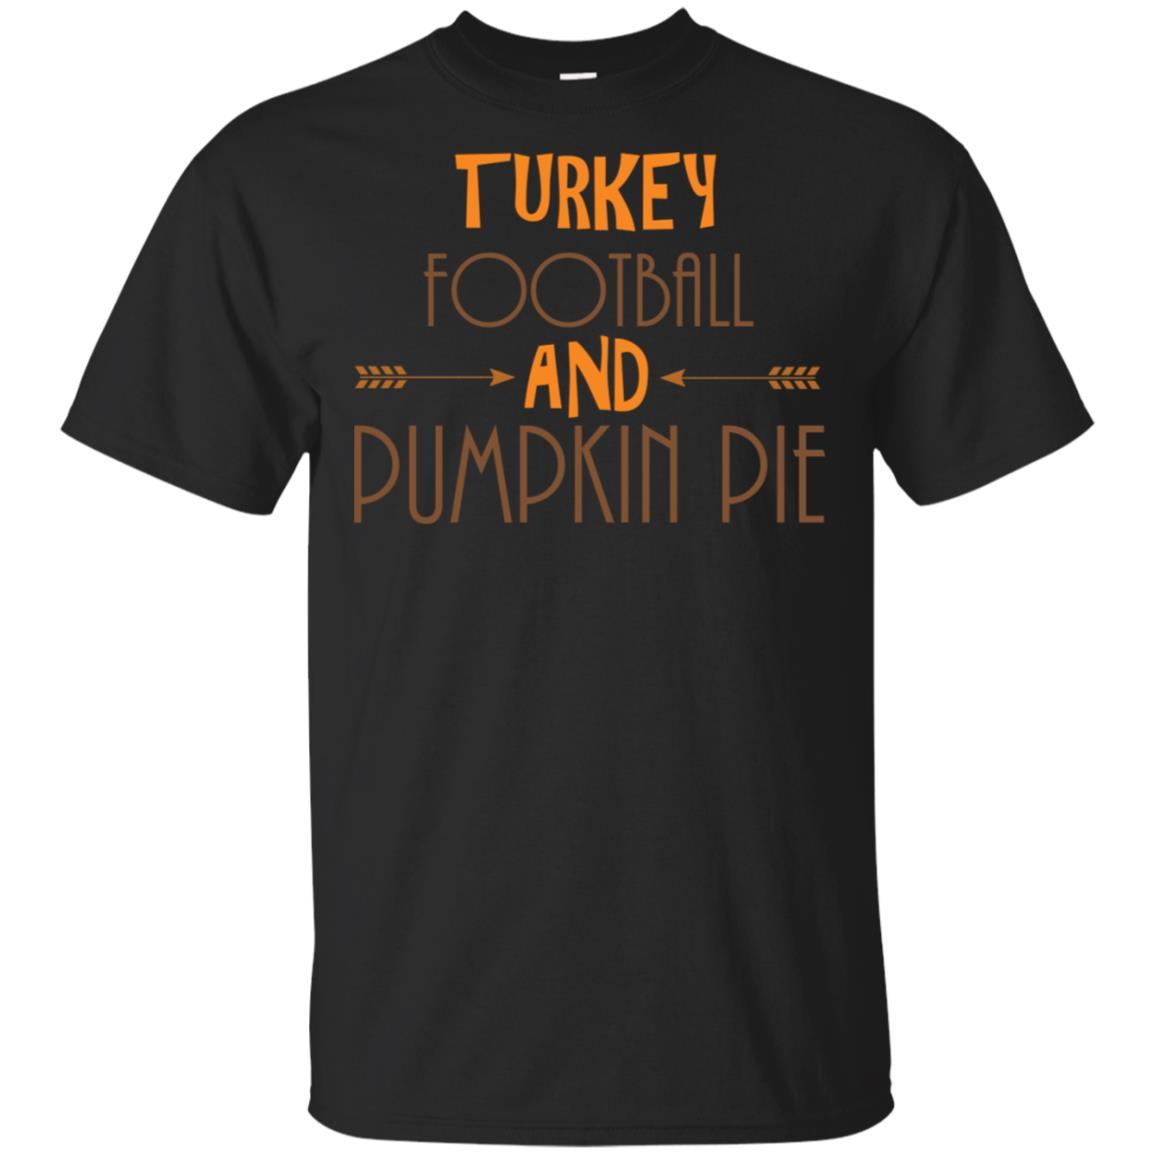 Thanksgiving Tee Turkey Football and Pumpkin Pie Unisex Short Sleeve